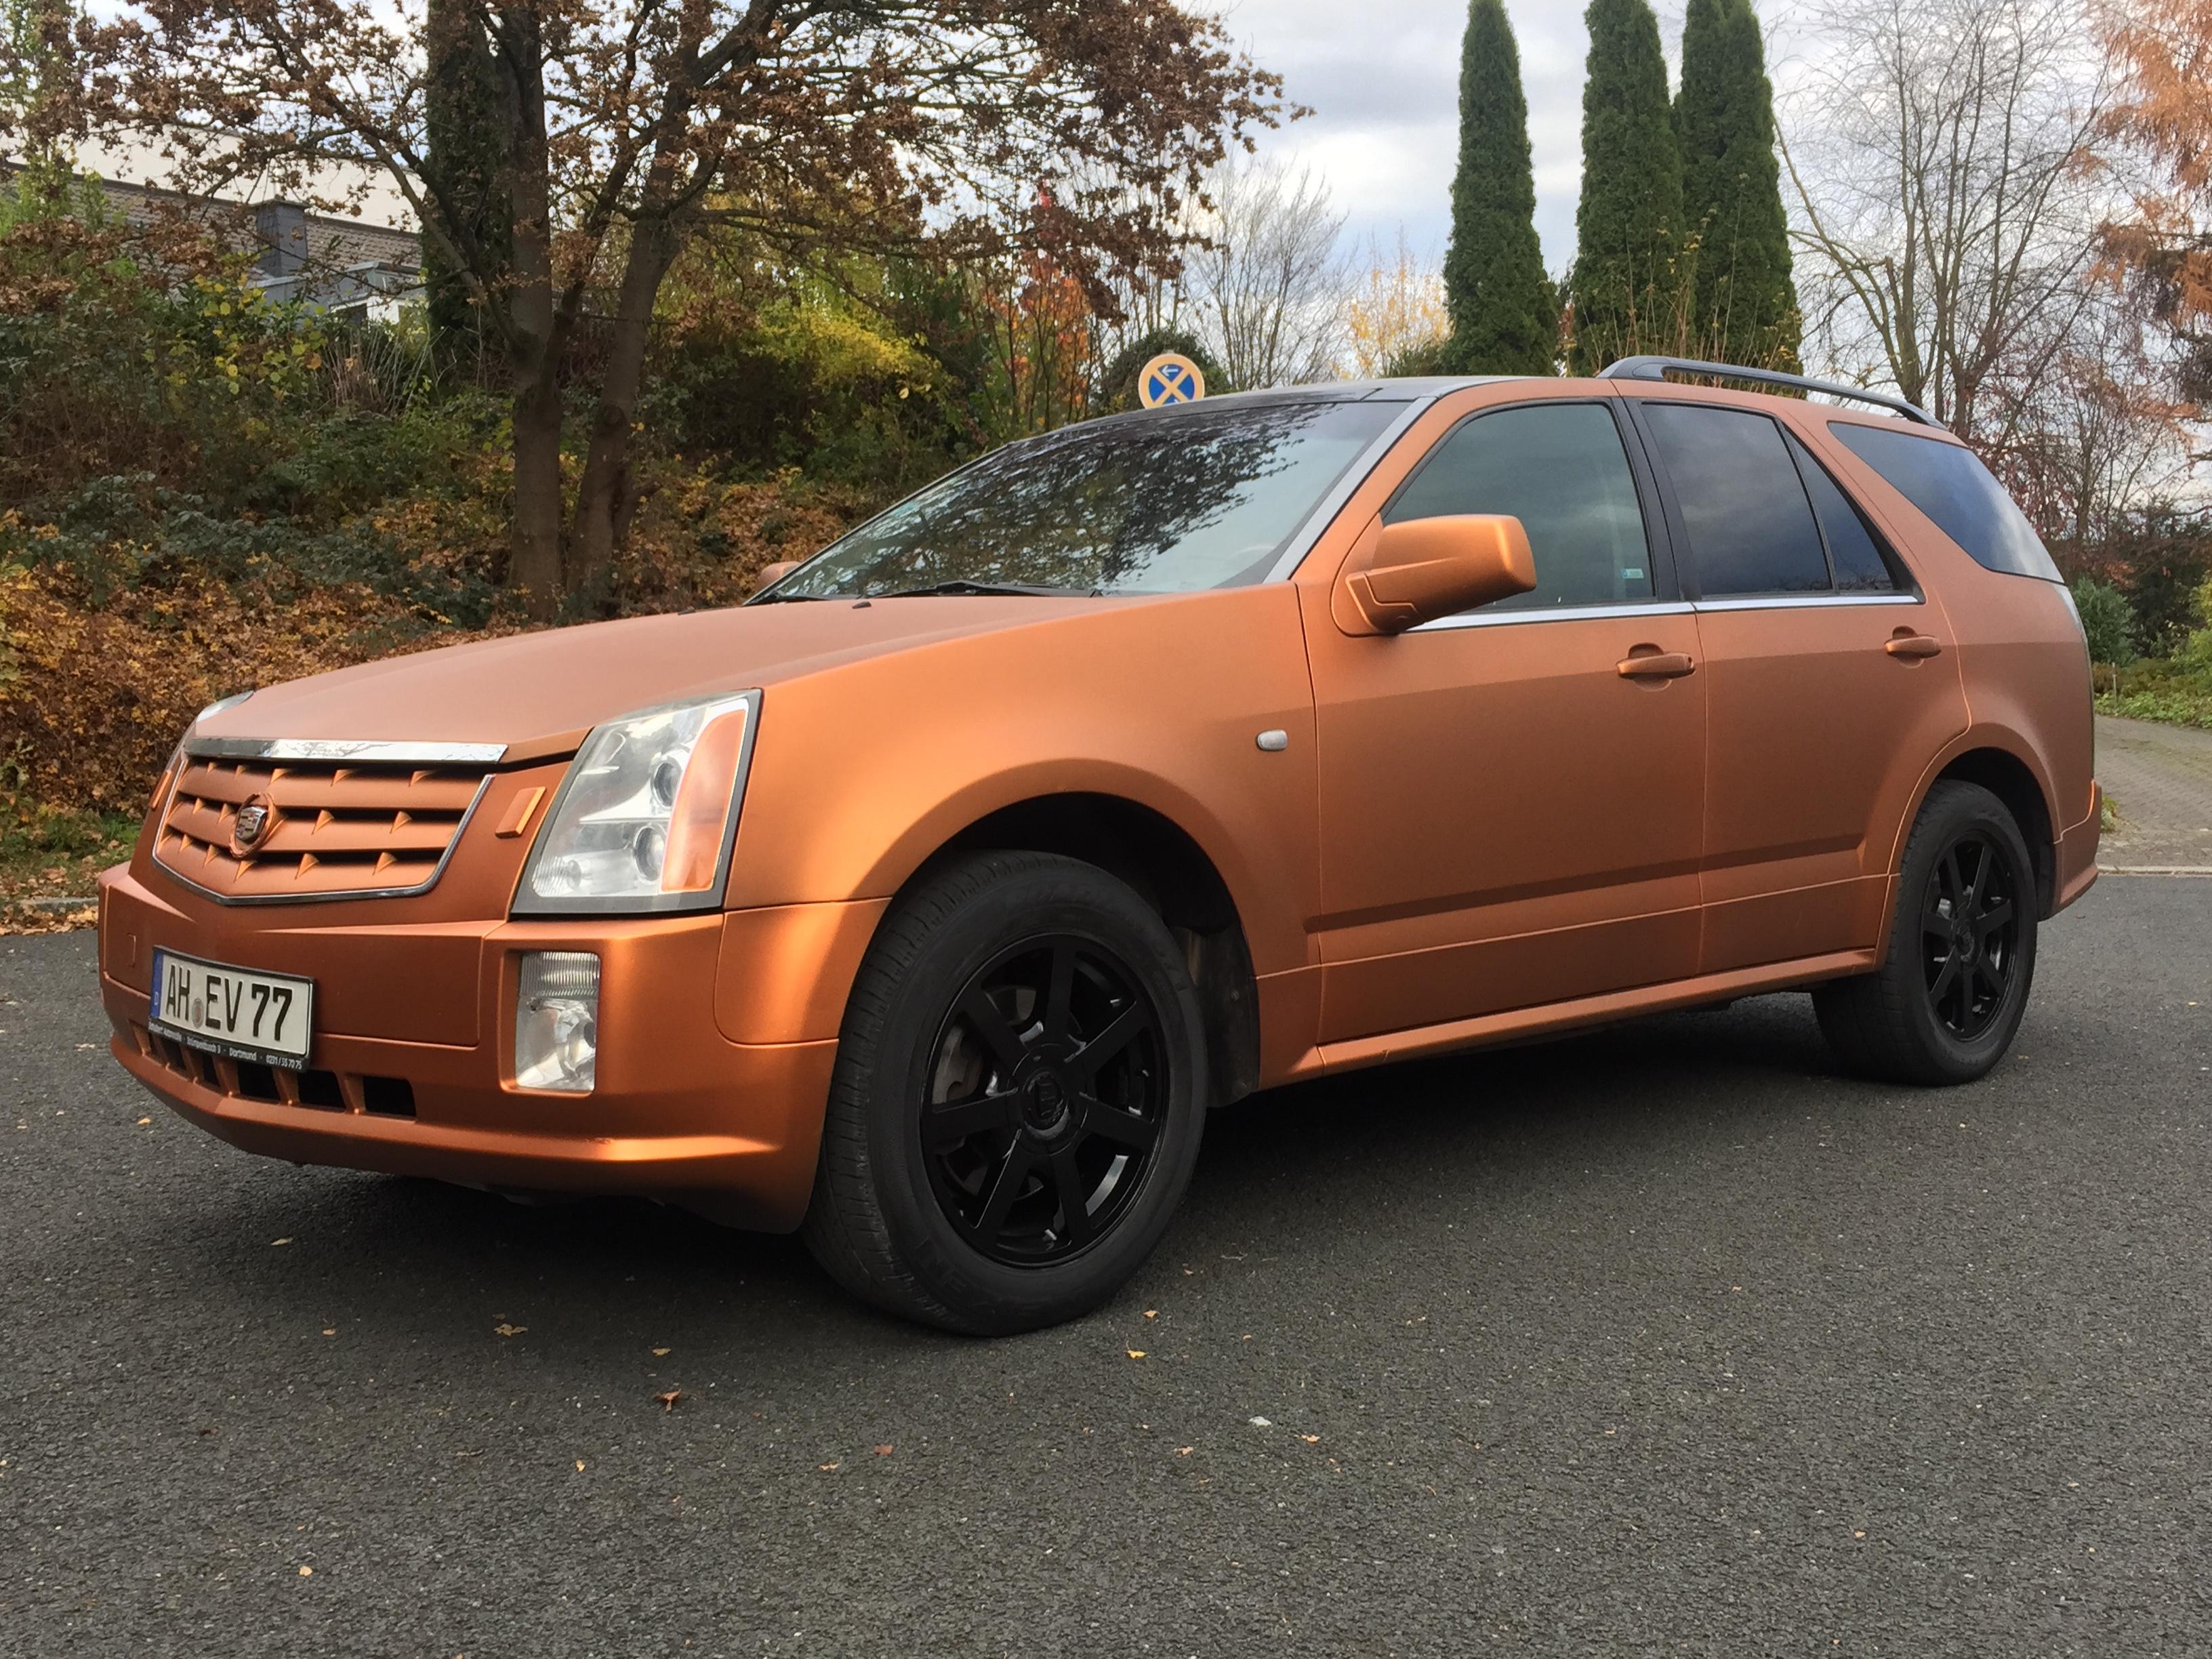 Cadillac_3417